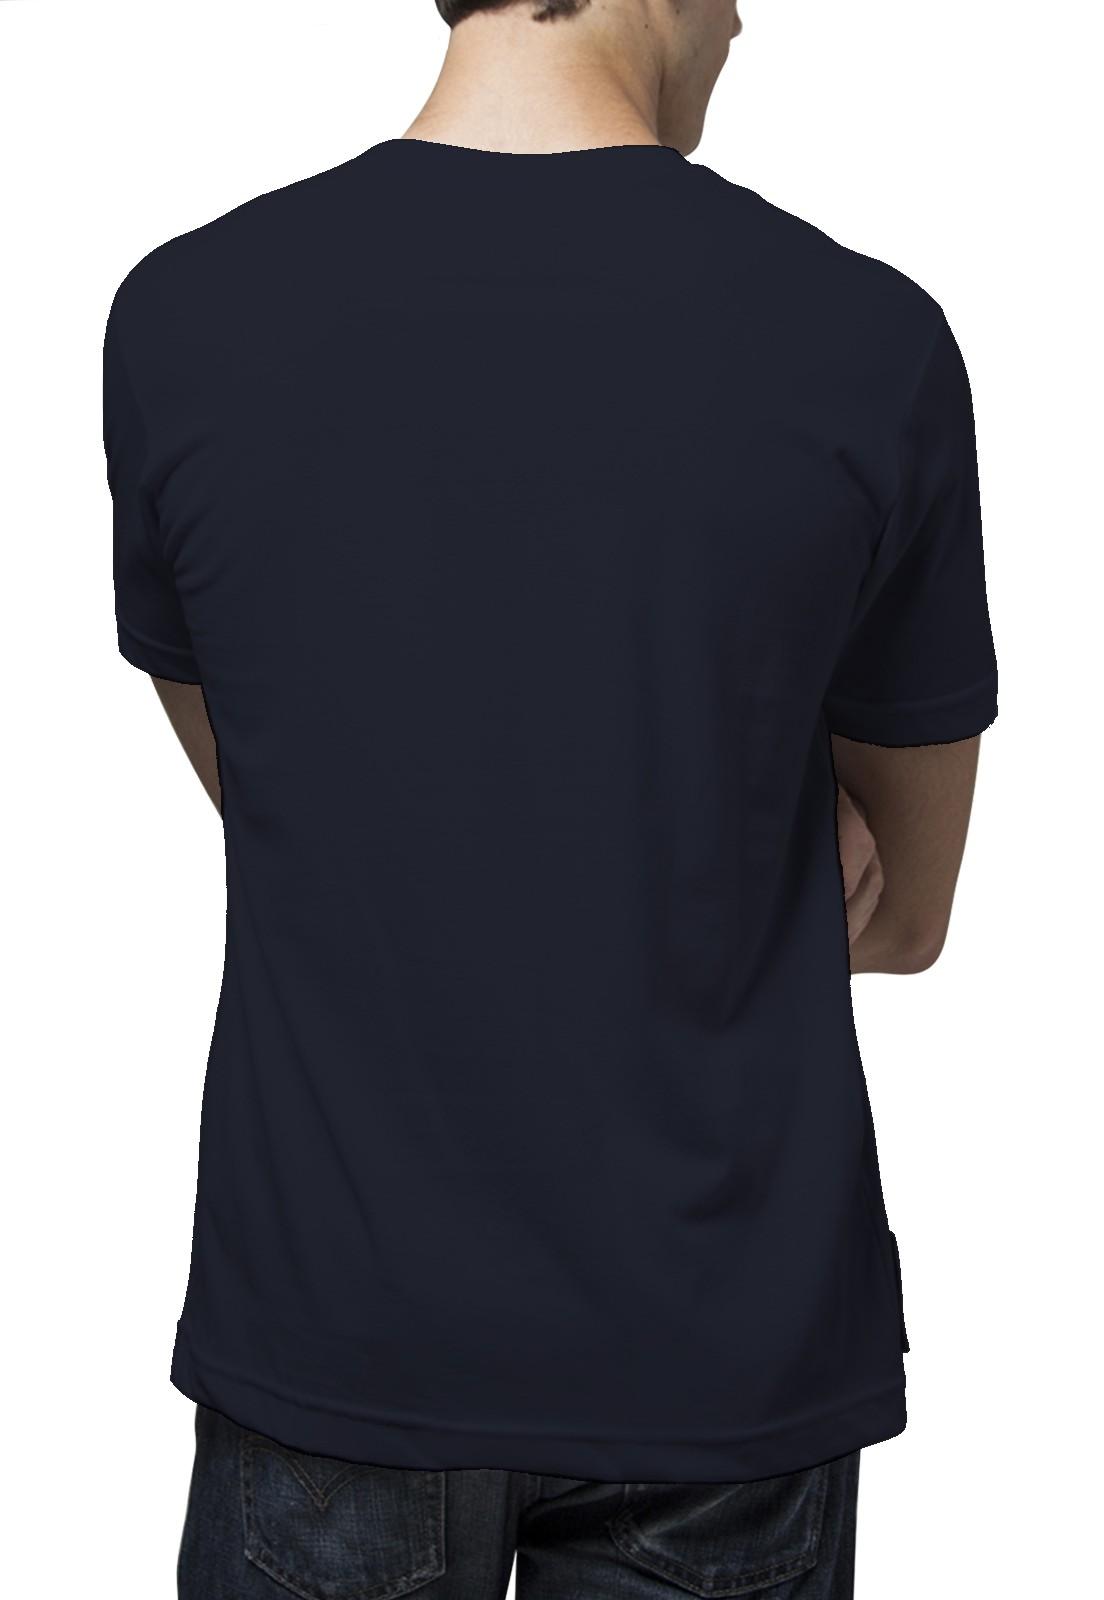 Camiseta Amazônia Micro Folhas - Azul Escuro